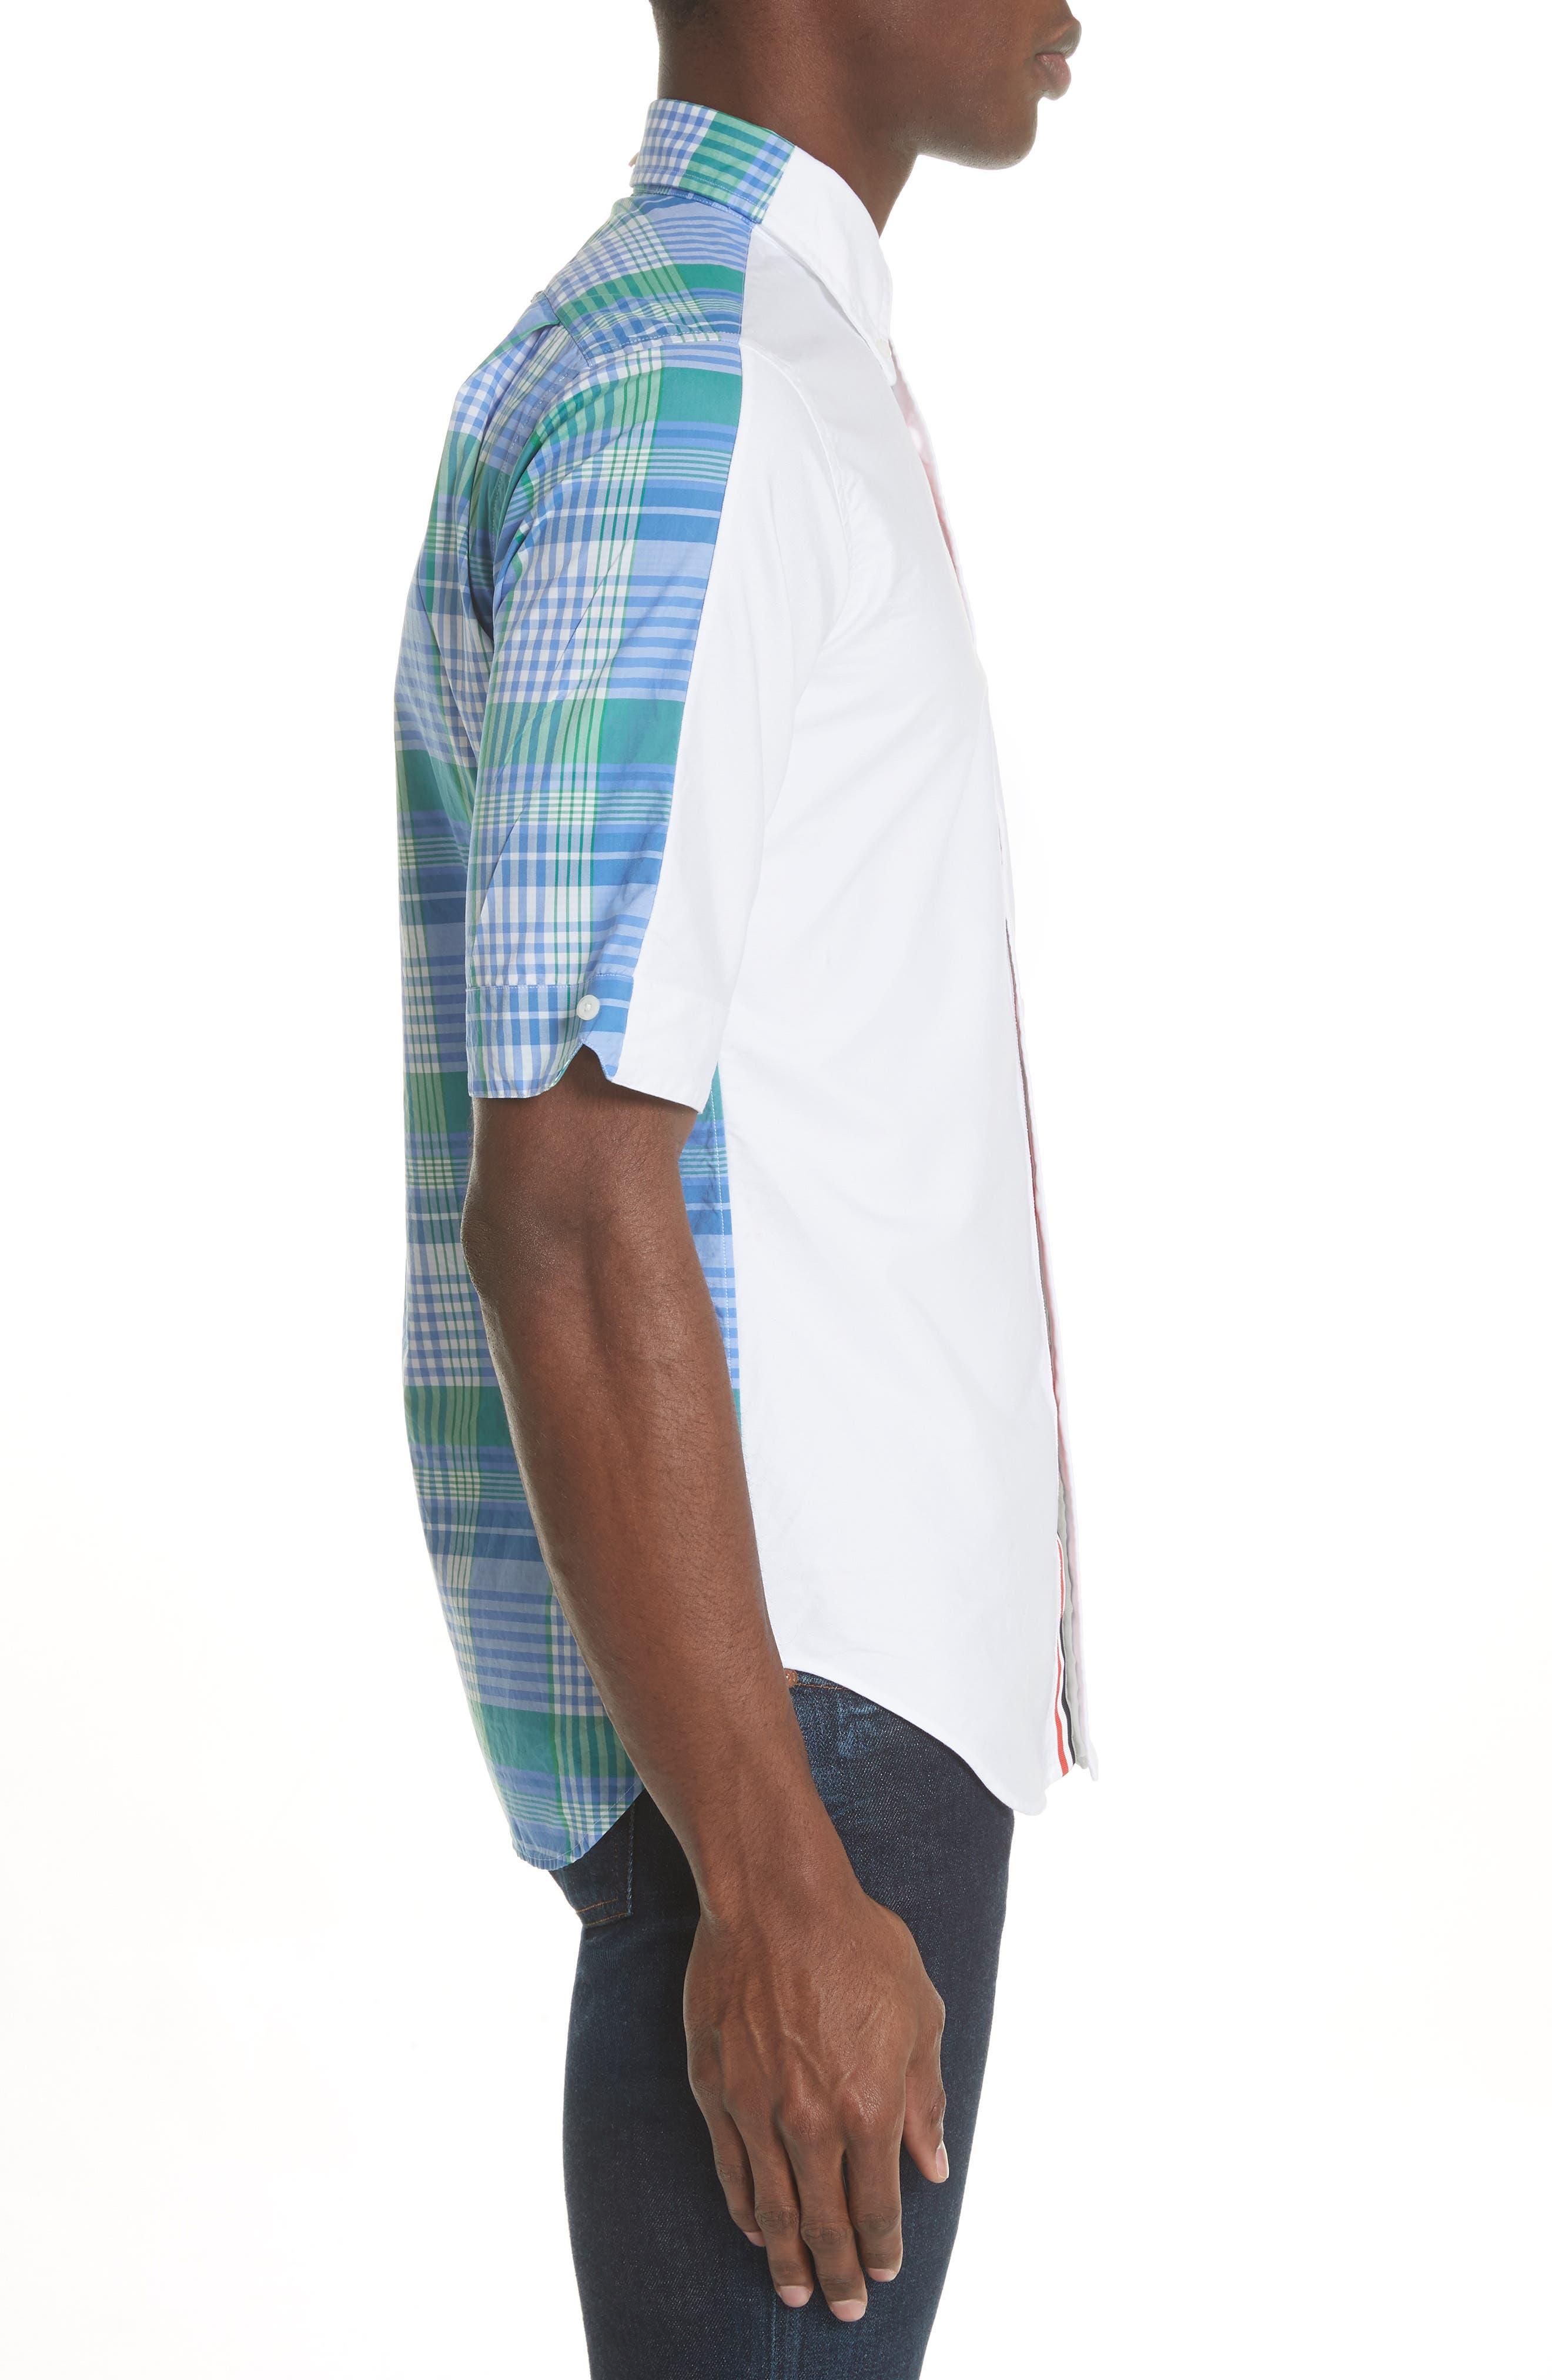 Solid & Plaid Woven Shirt,                             Alternate thumbnail 3, color,                             470